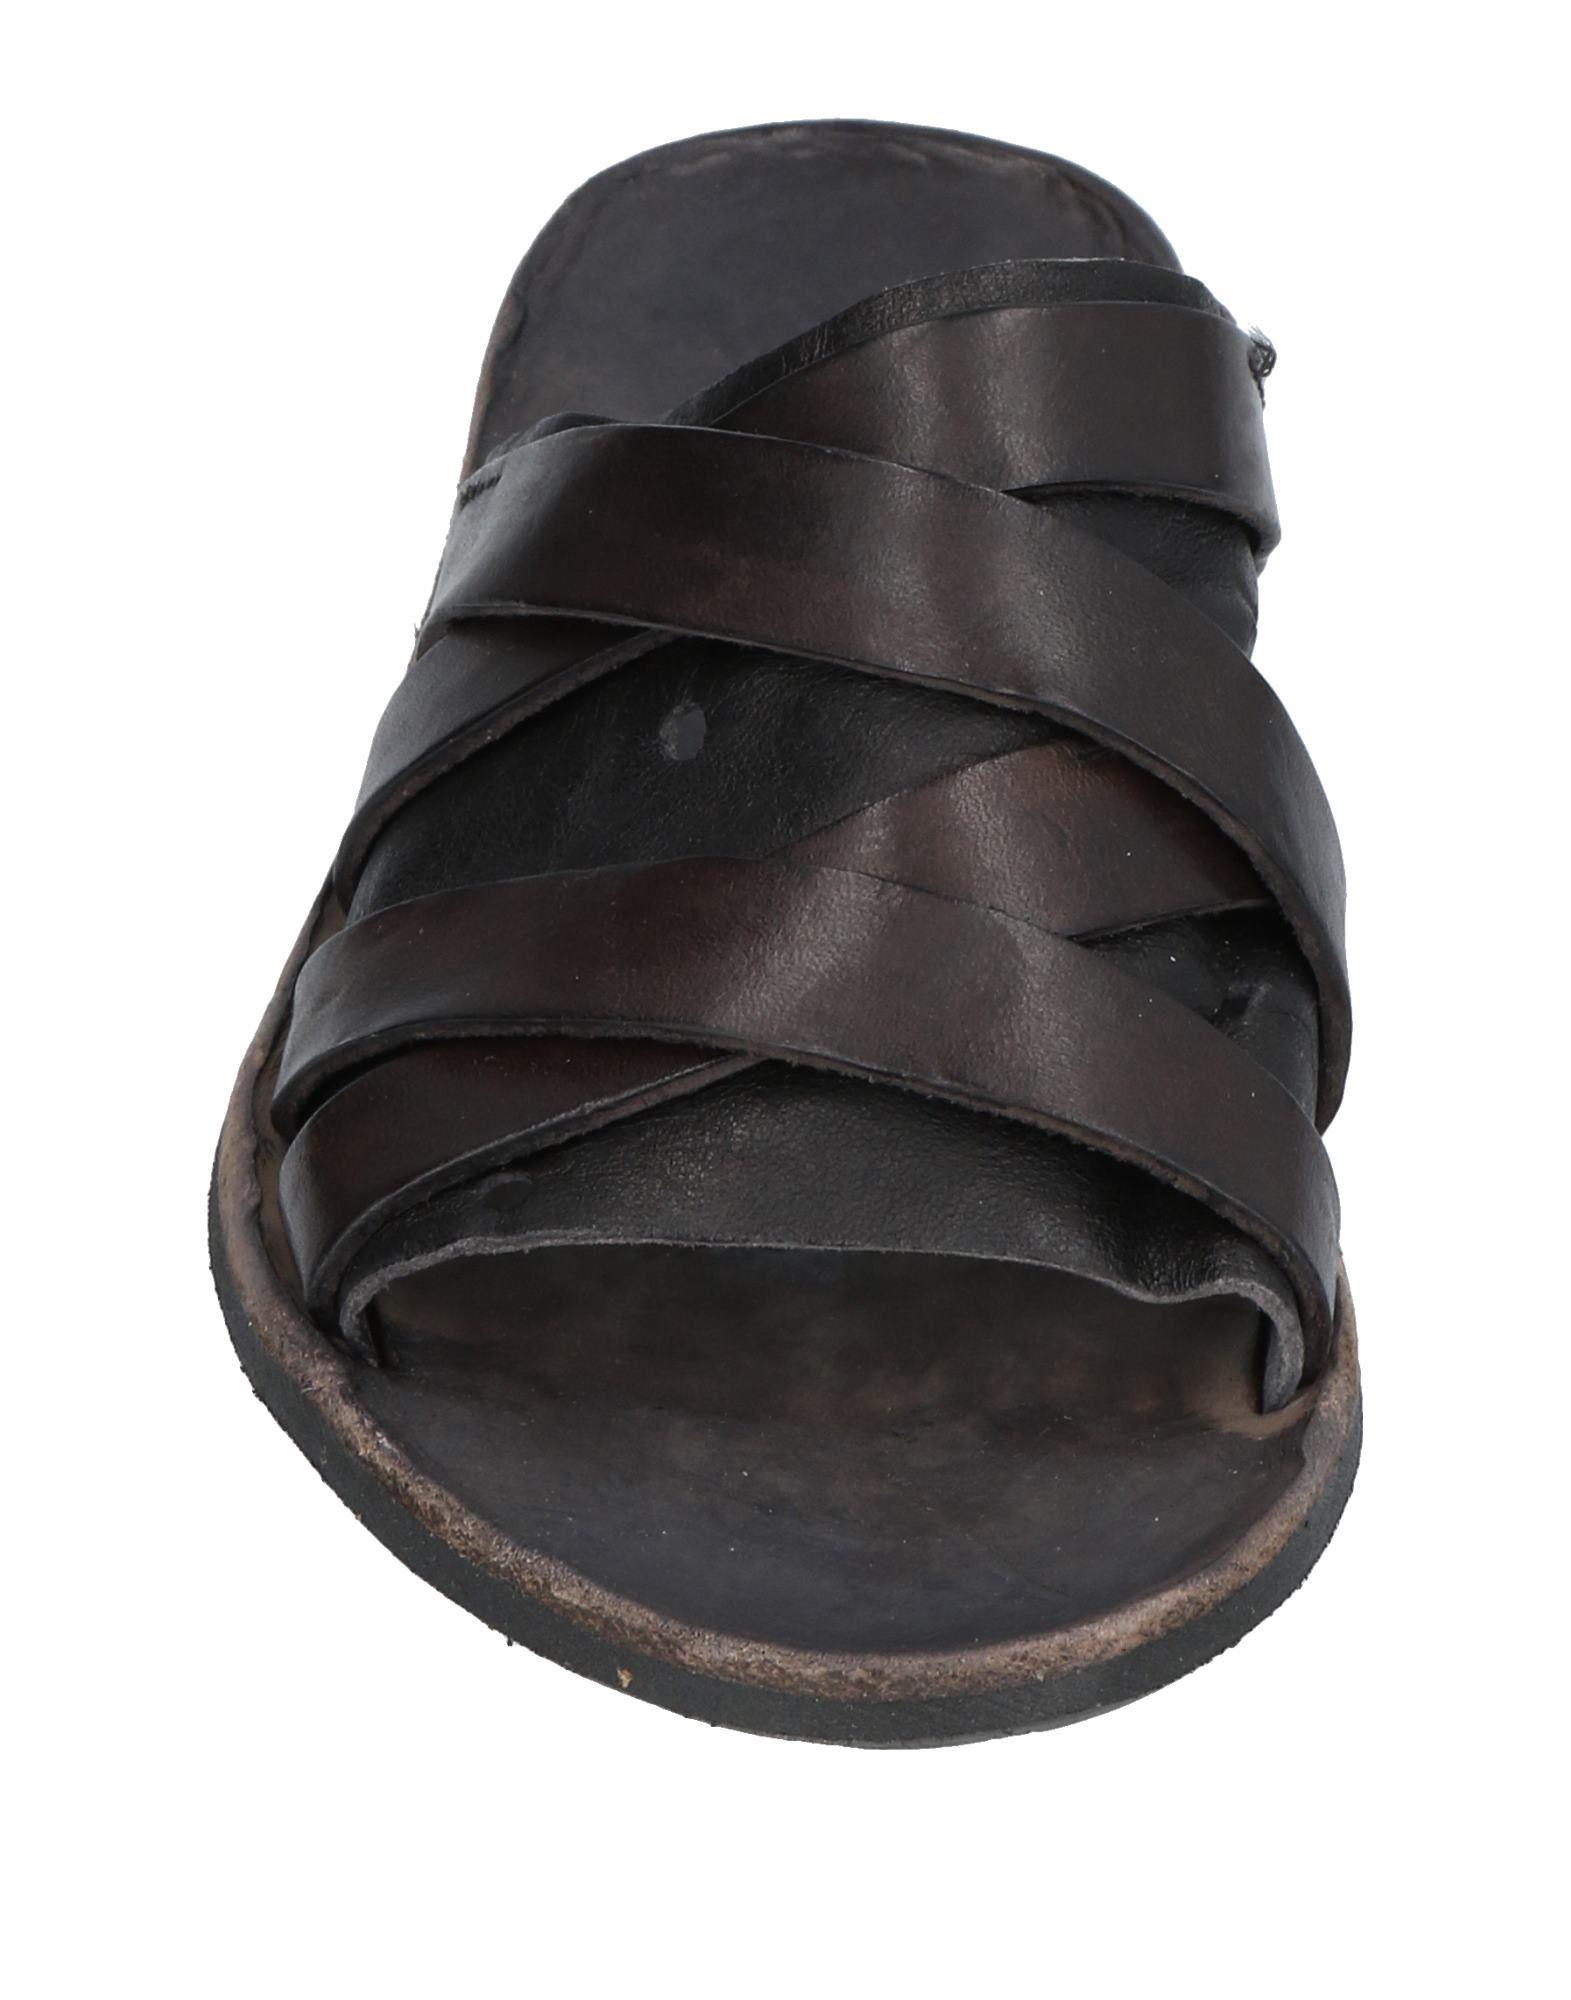 Sandales Brador Femme - Sandales Brador sur